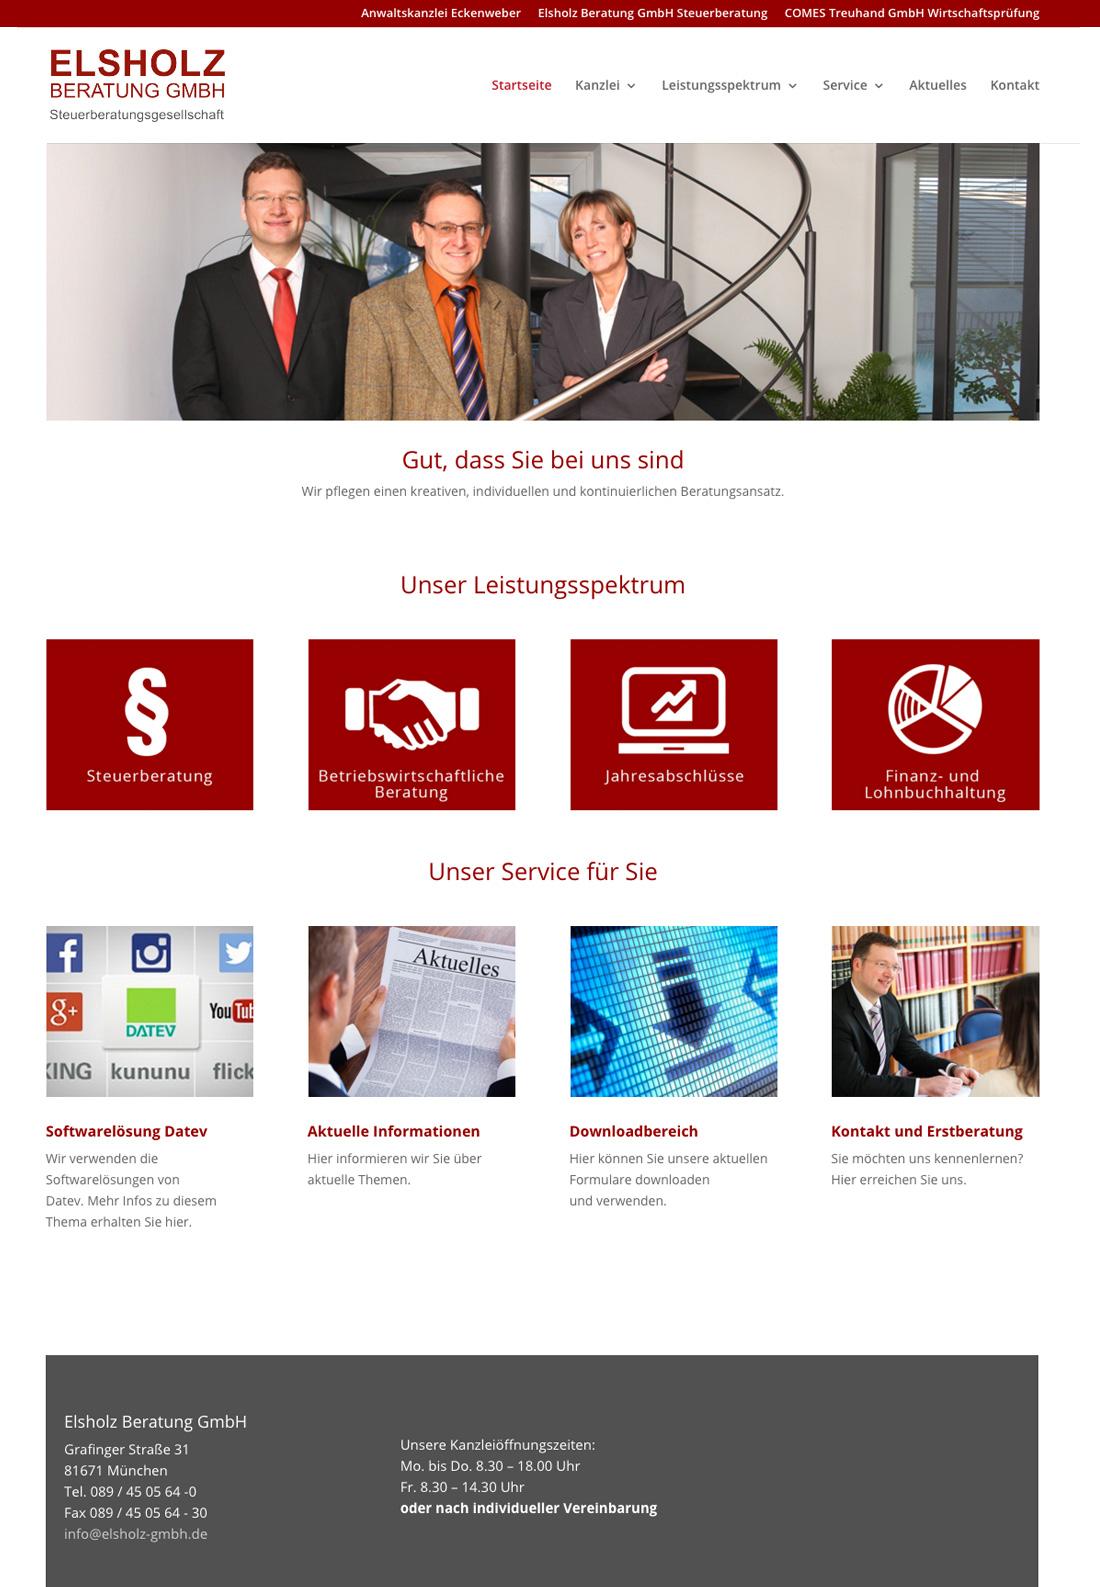 Onepager der Steuerberater der Elsholz GmbH